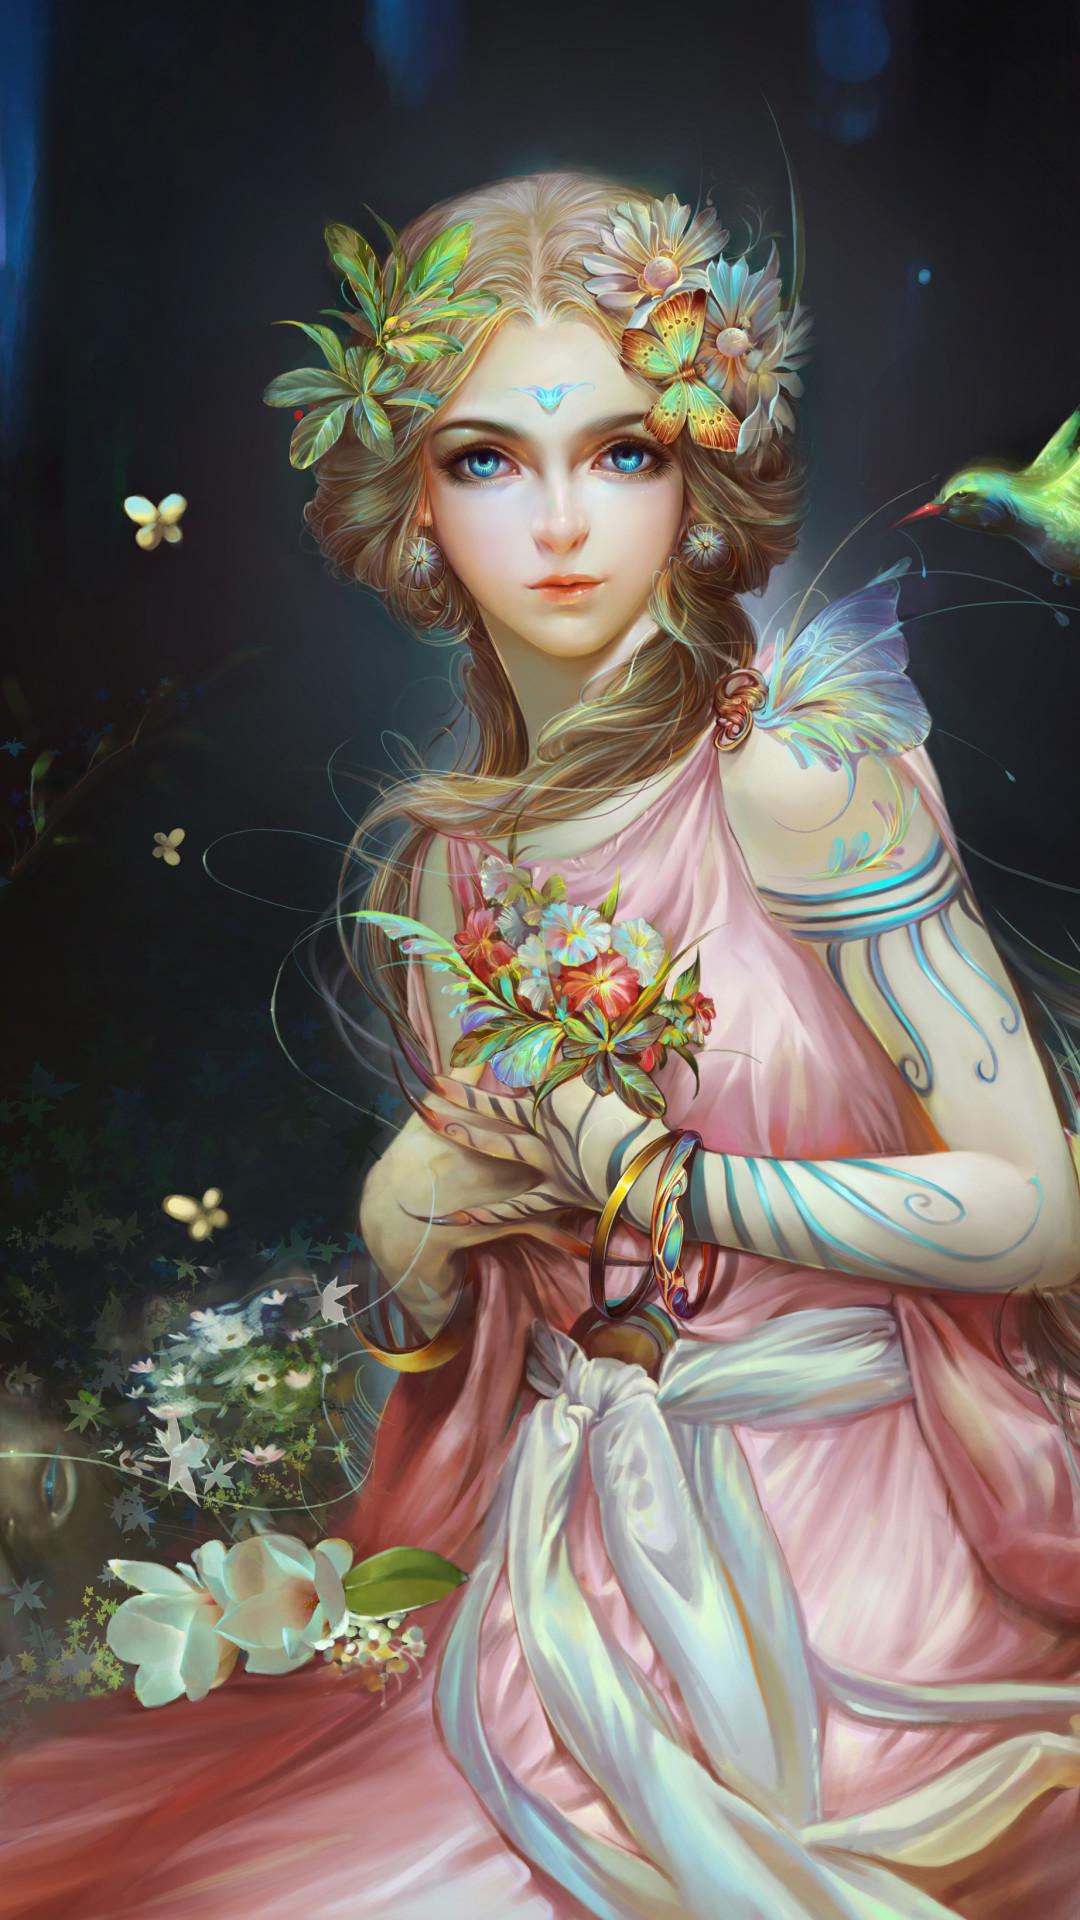 Fantasy Fairy Wallpaper (57+ Images